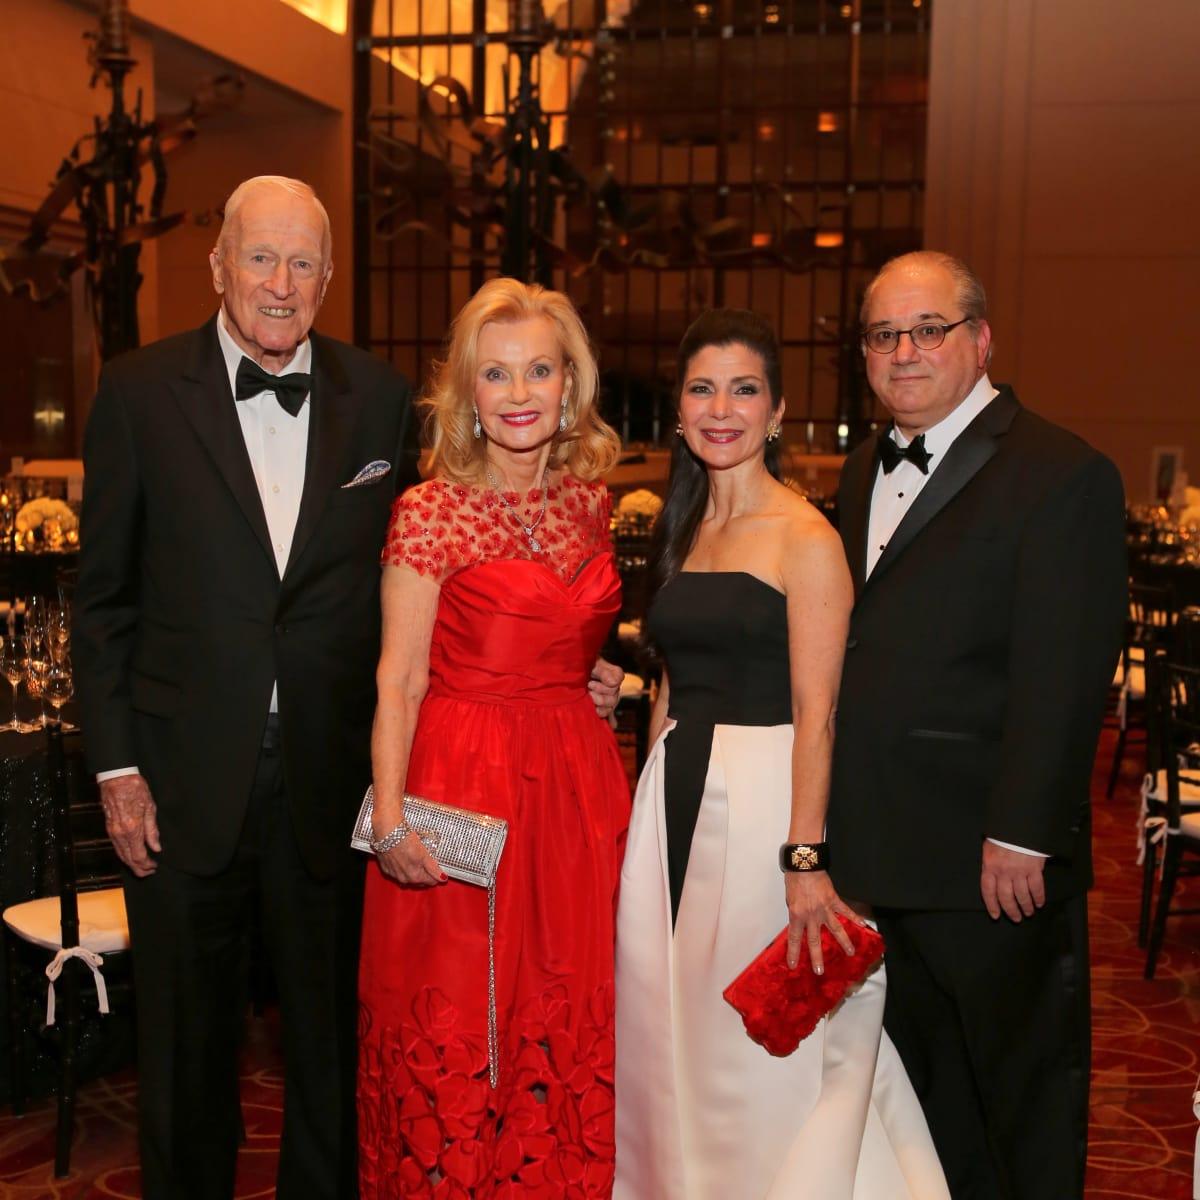 HGO Concert of Arias, Feb. 2016, Dan breen, Pat Breen, Cynthia Petrello, Tony Petrello